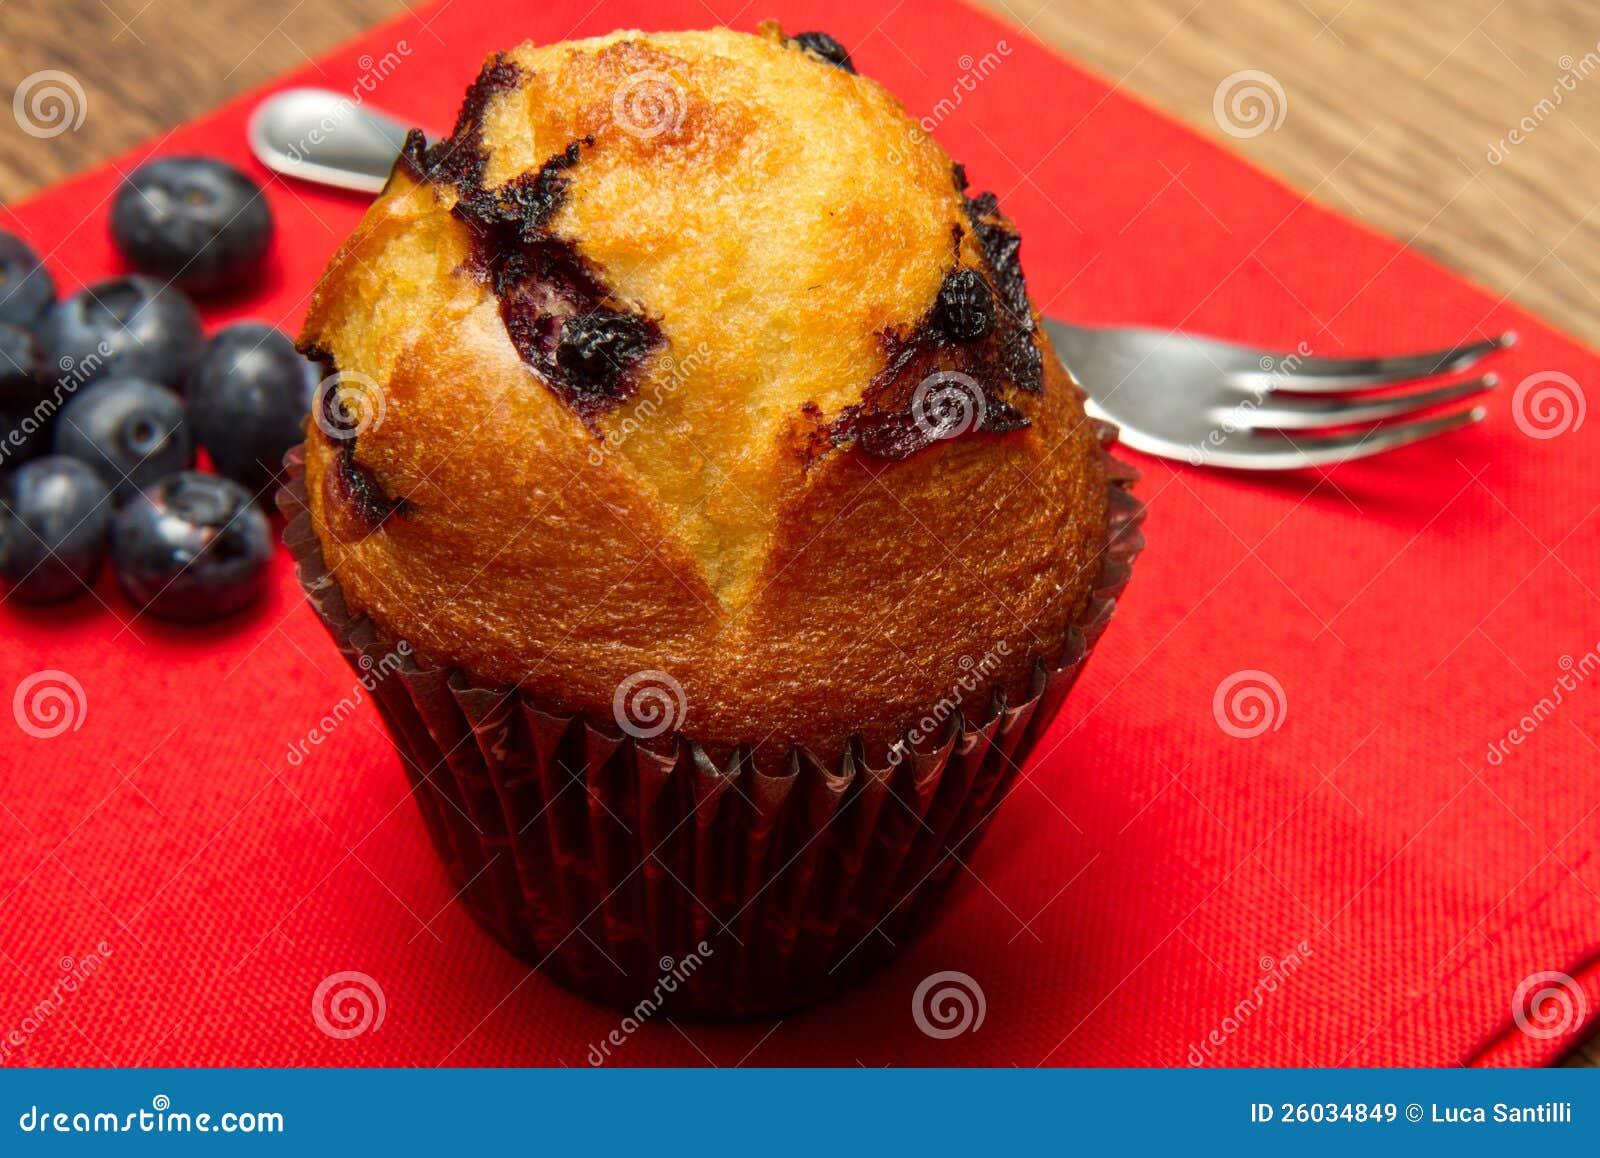 Schokoladenchip-Muffin